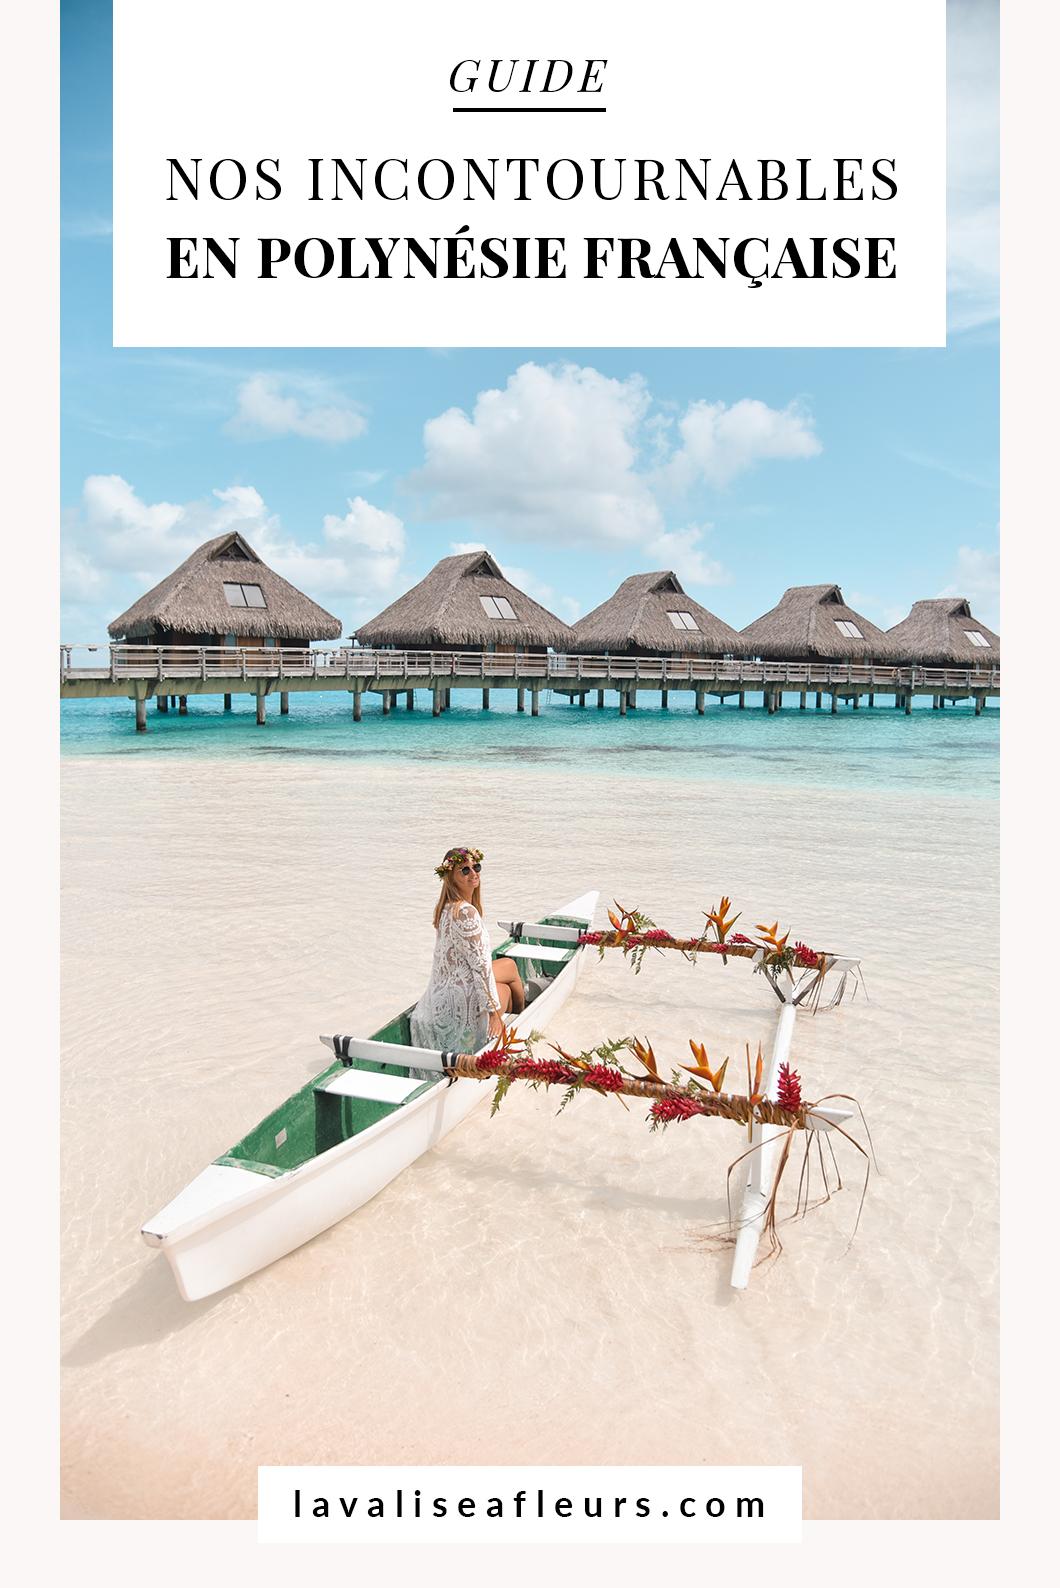 Organiser son voyage en polynesie française, nos incontournables